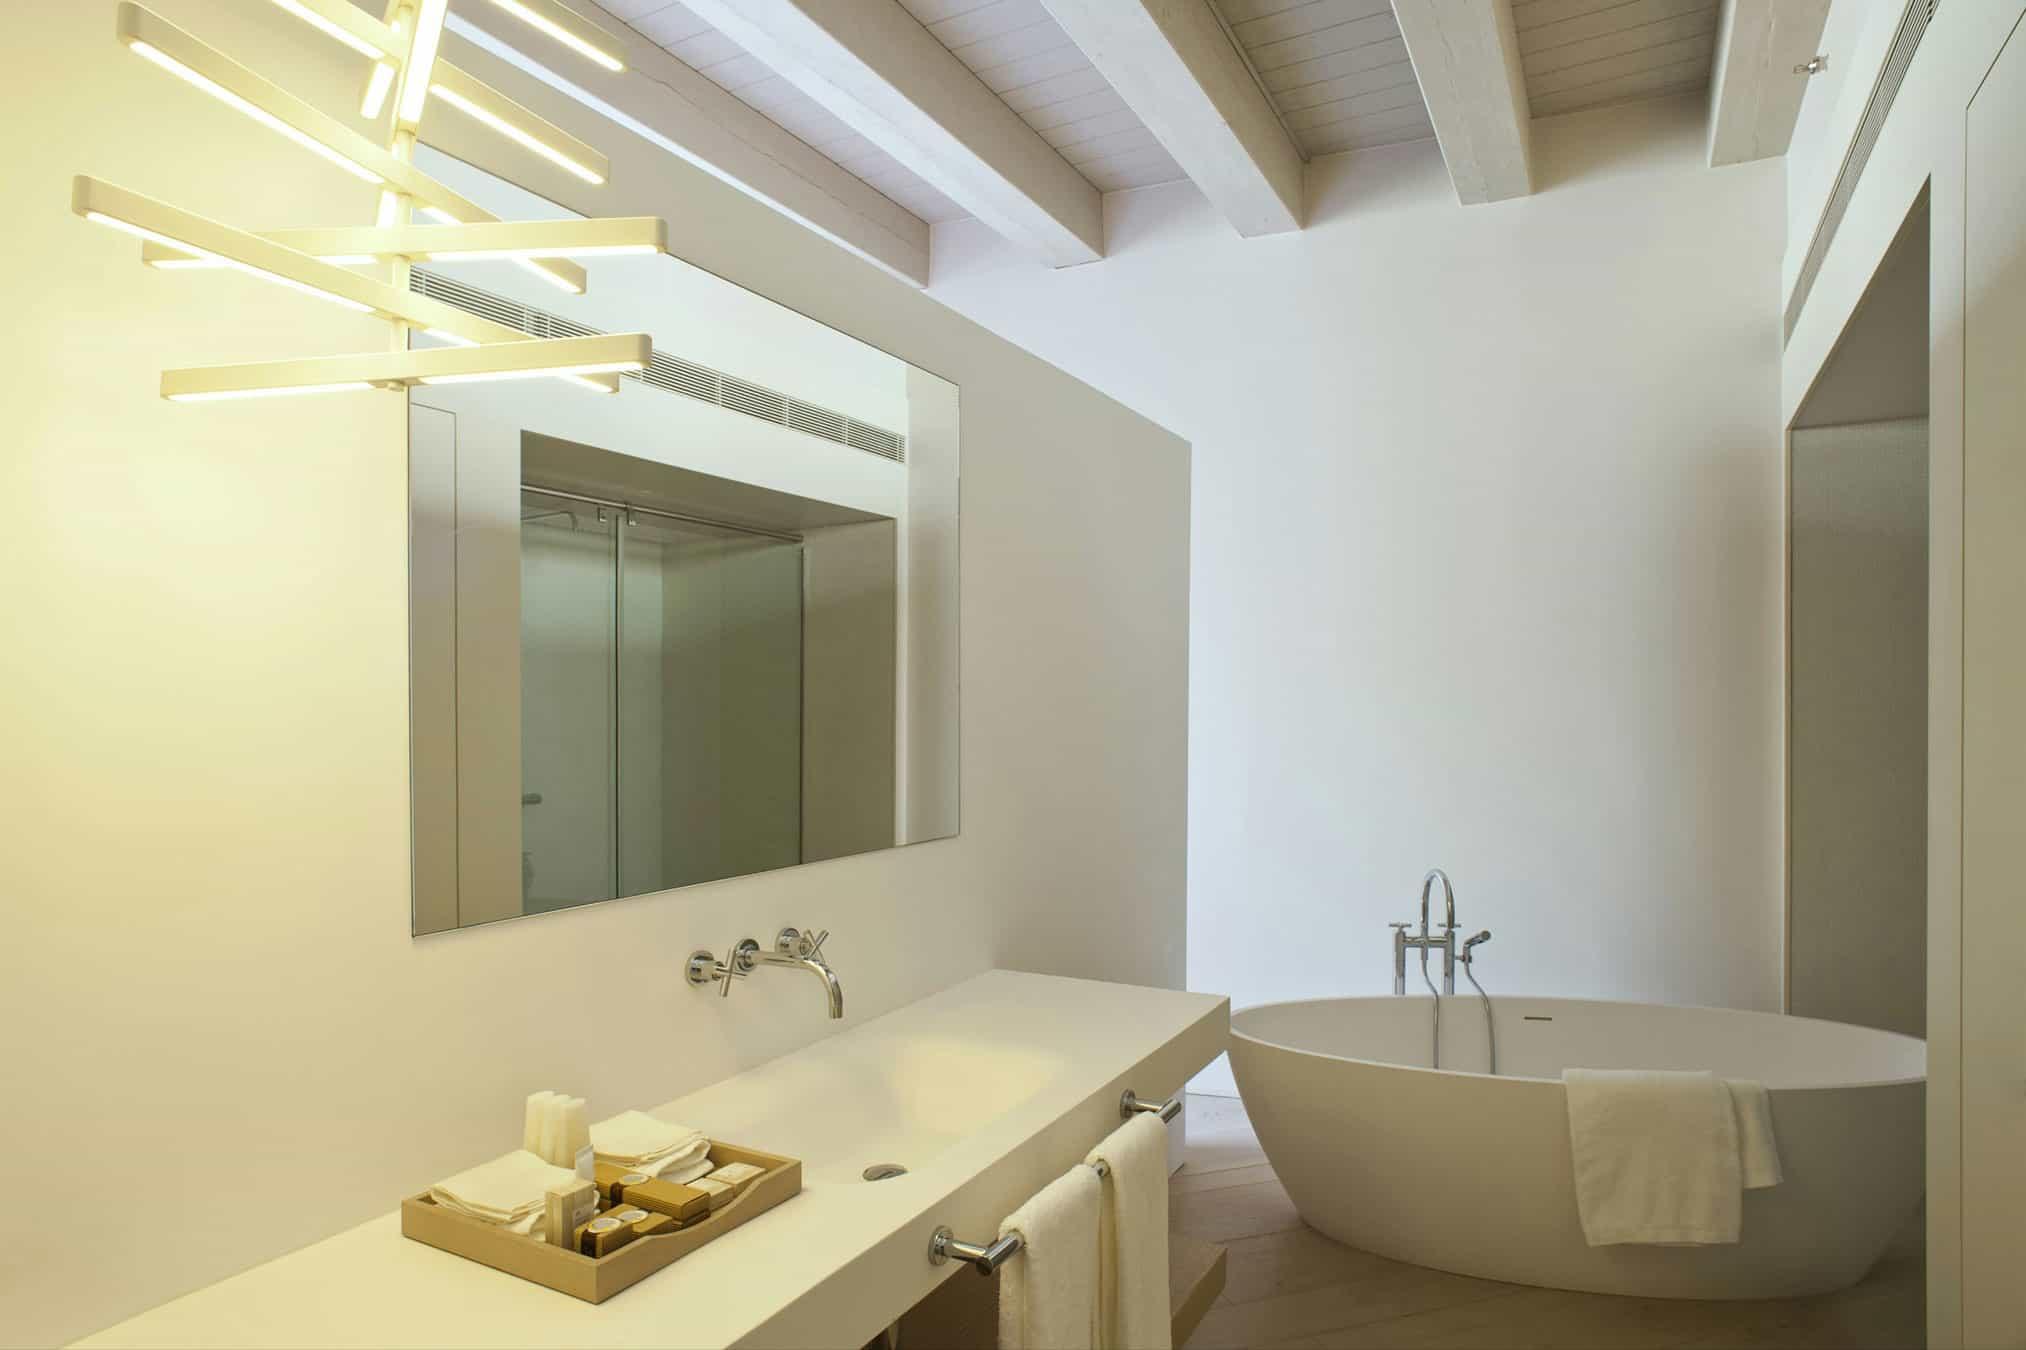 Mercer Hotel Barcelona by Rafael Moneo (31)